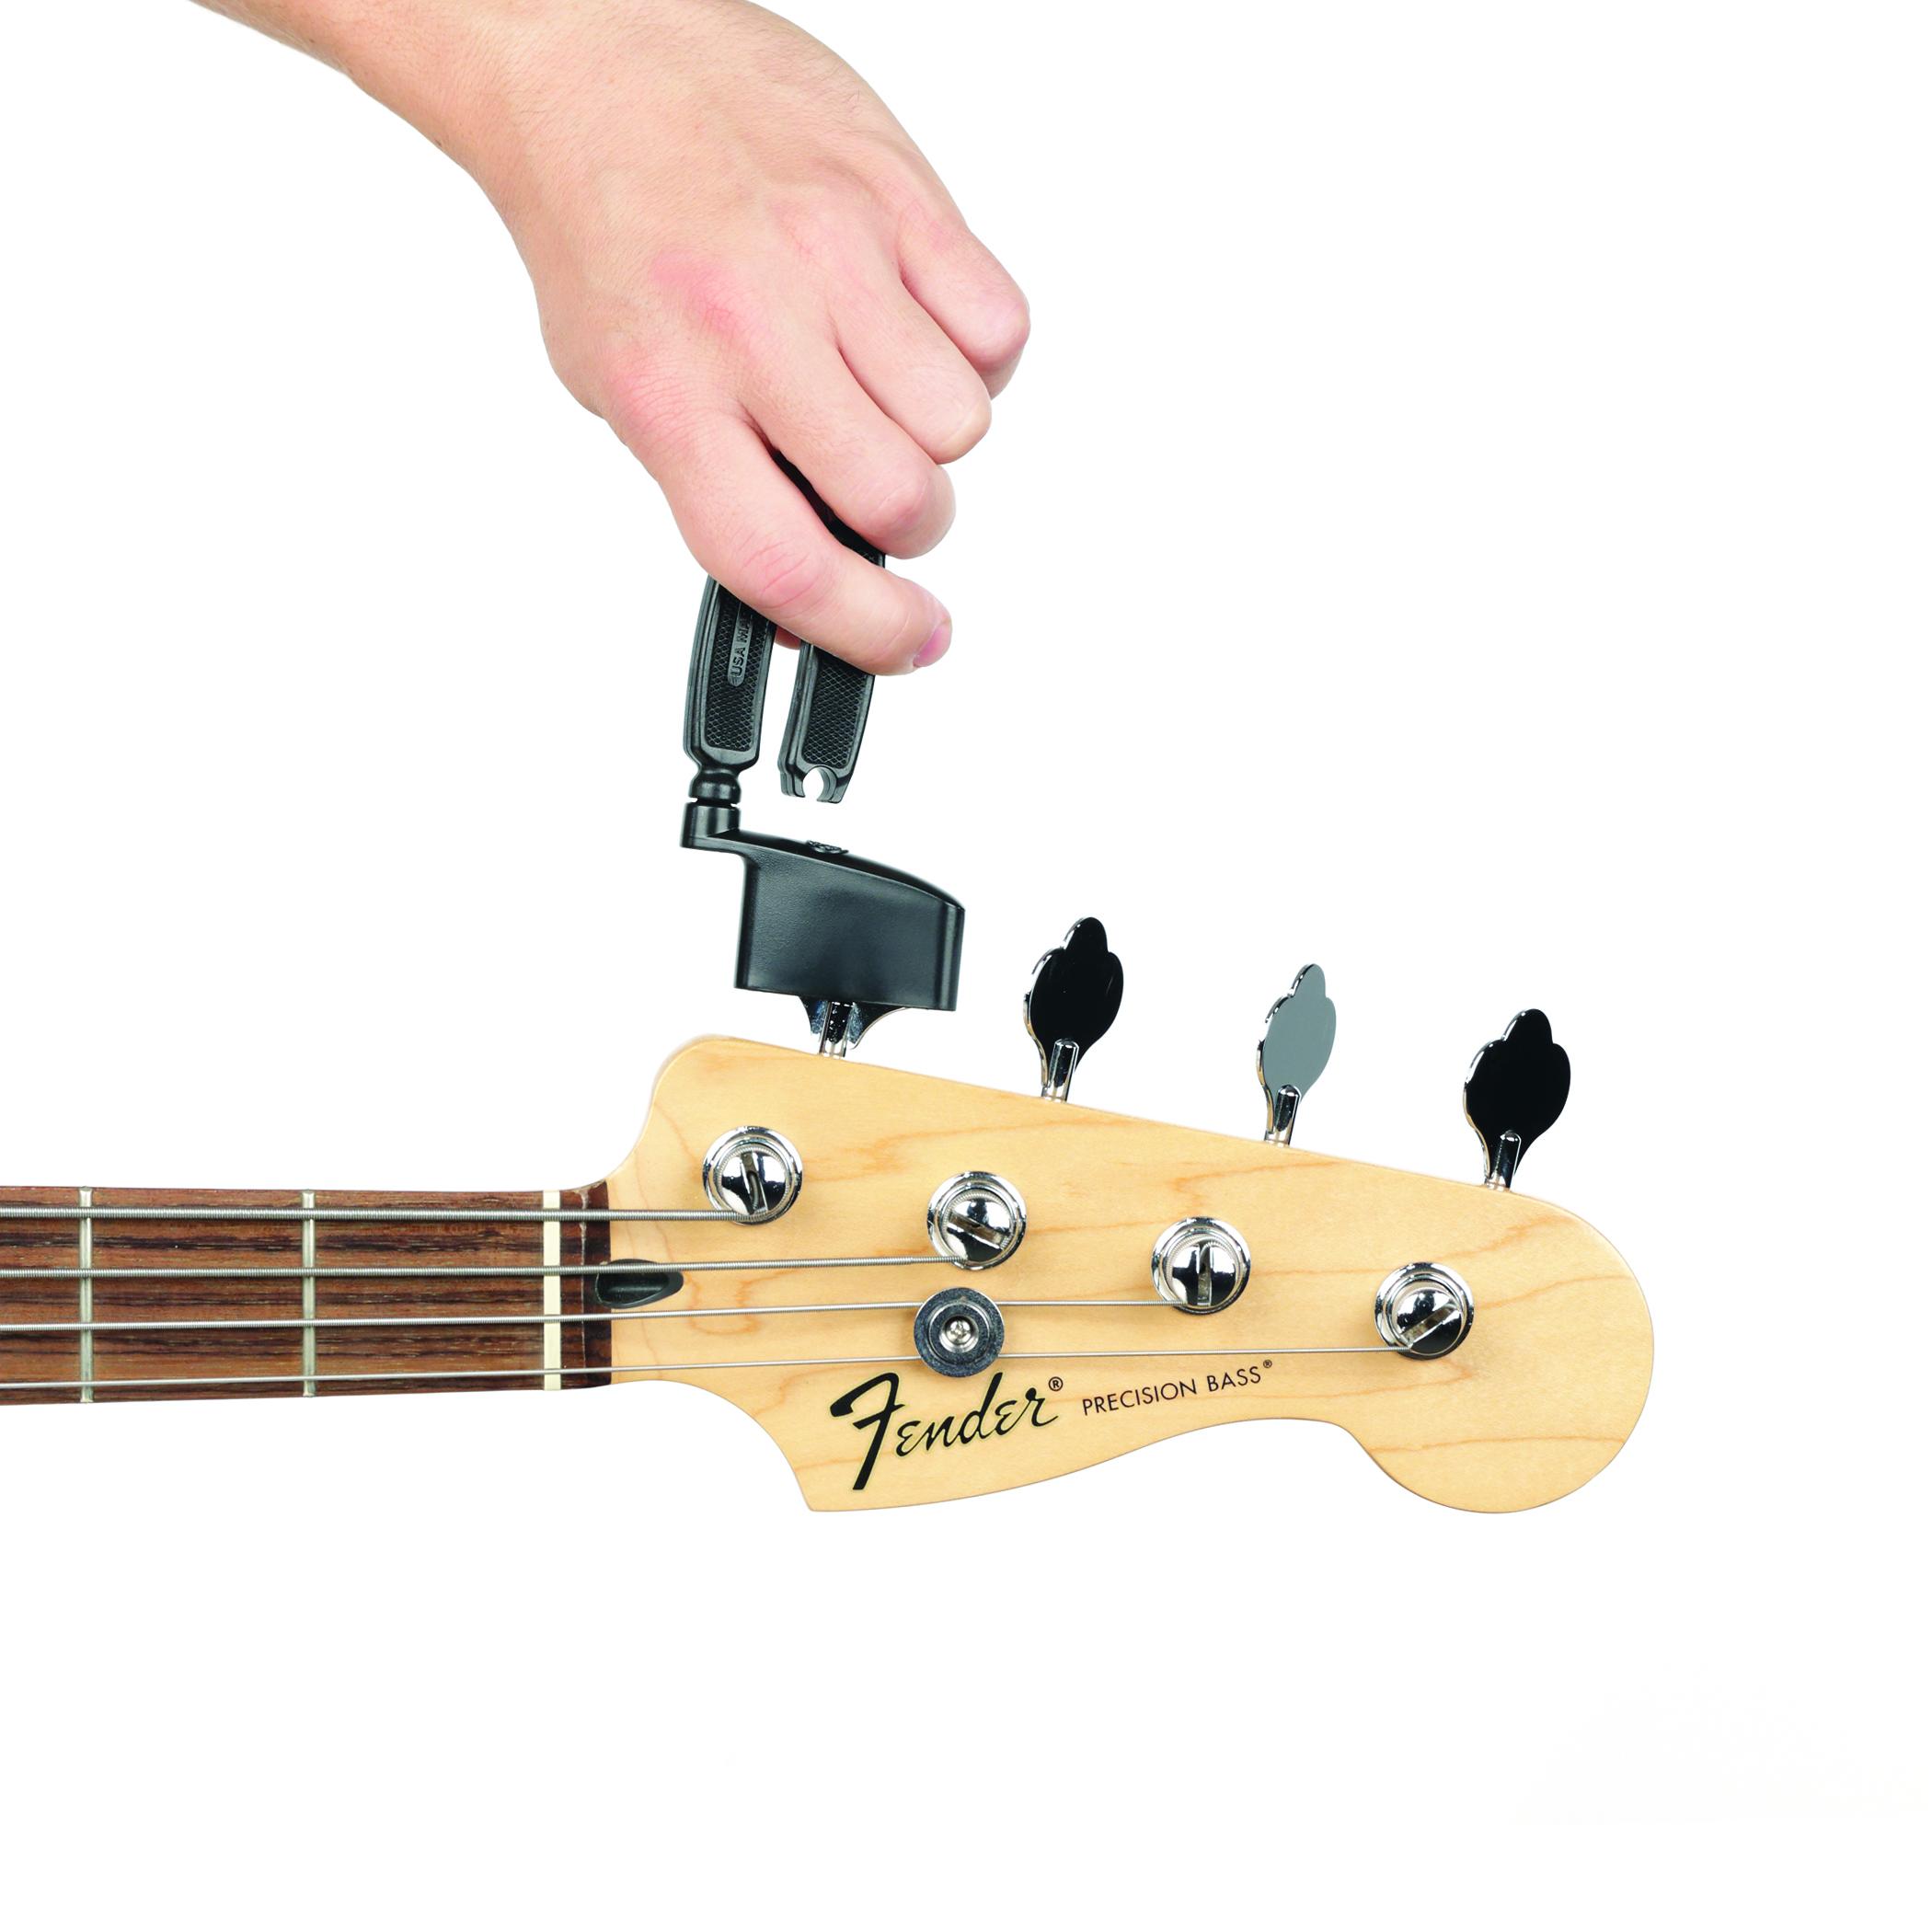 D'Addario Bass Pro-Winder